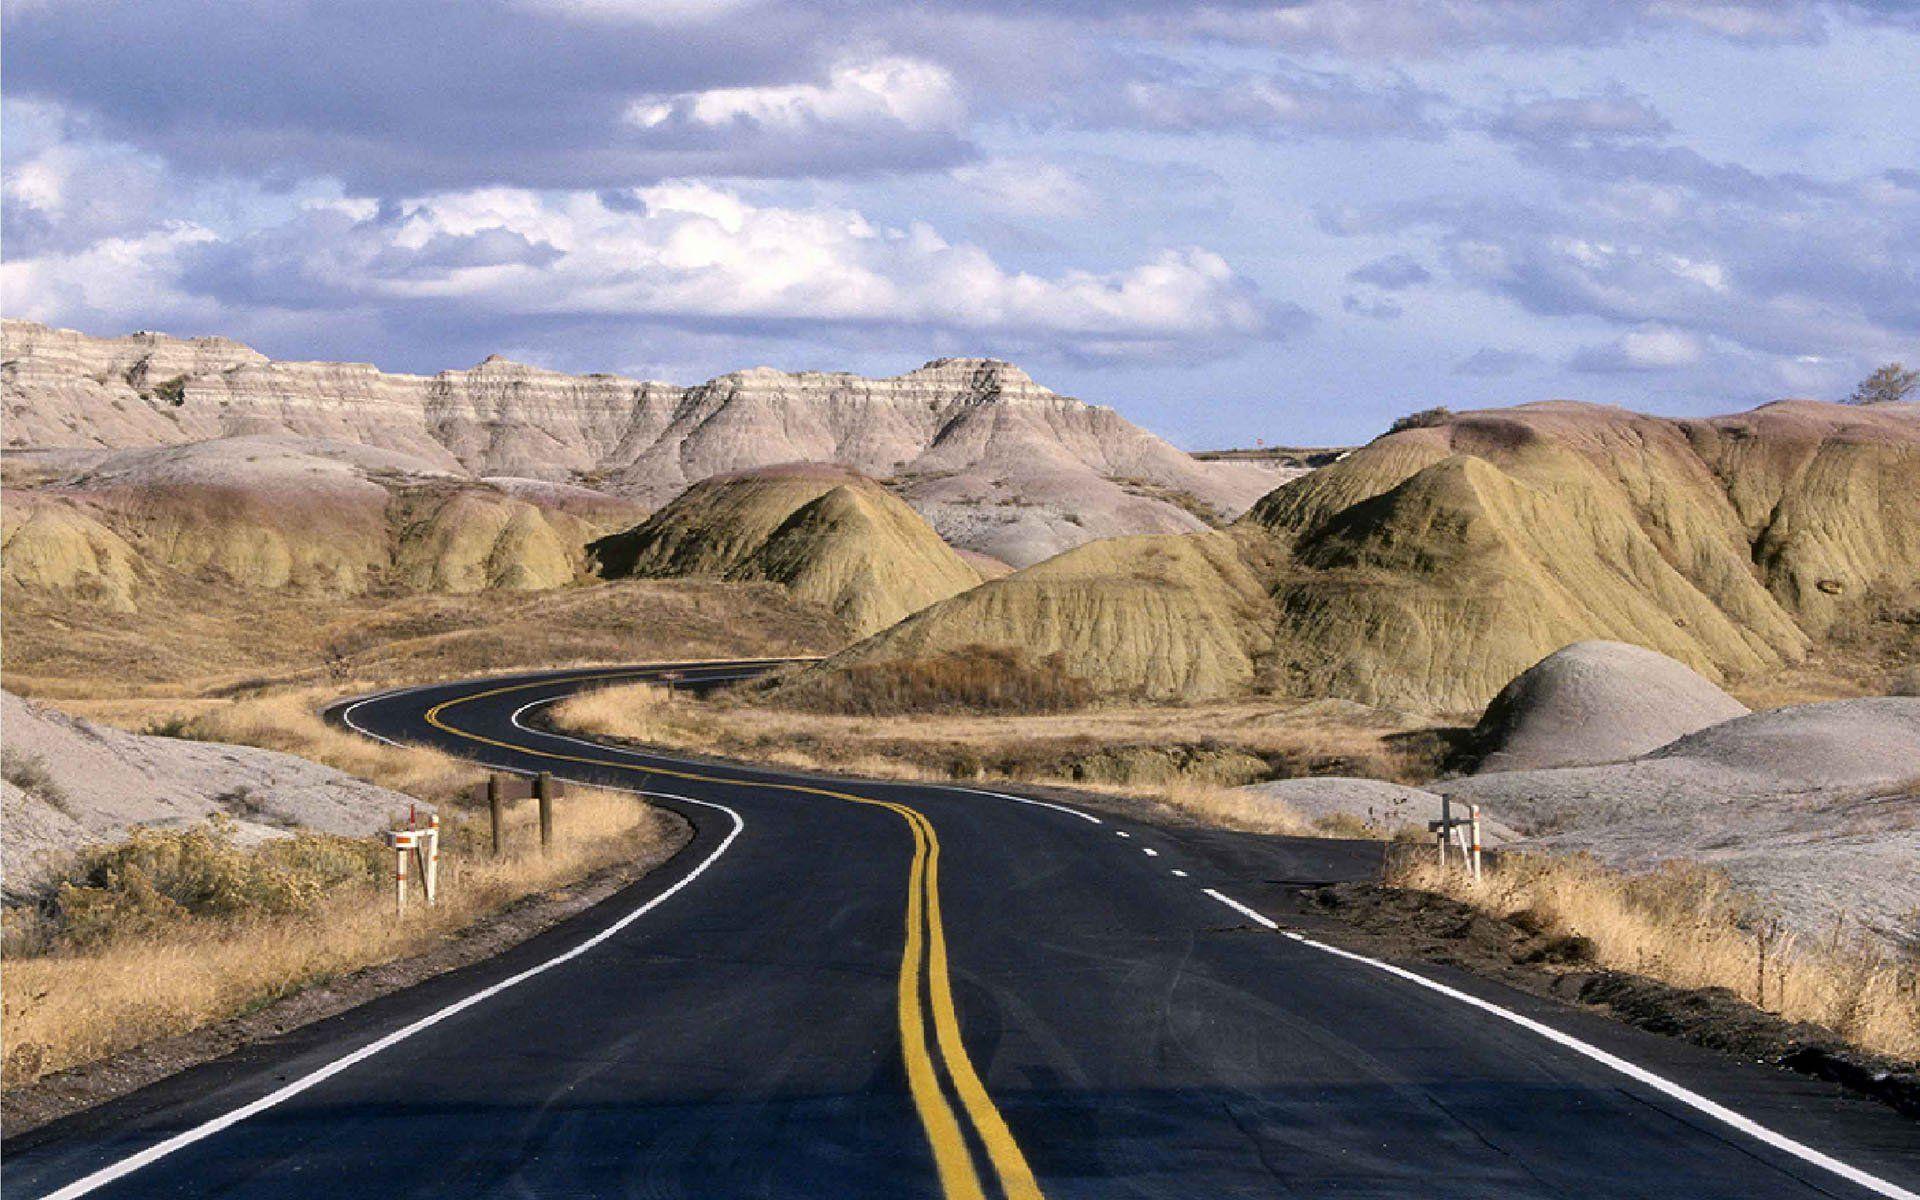 HD Badlands National Park Wallpapers